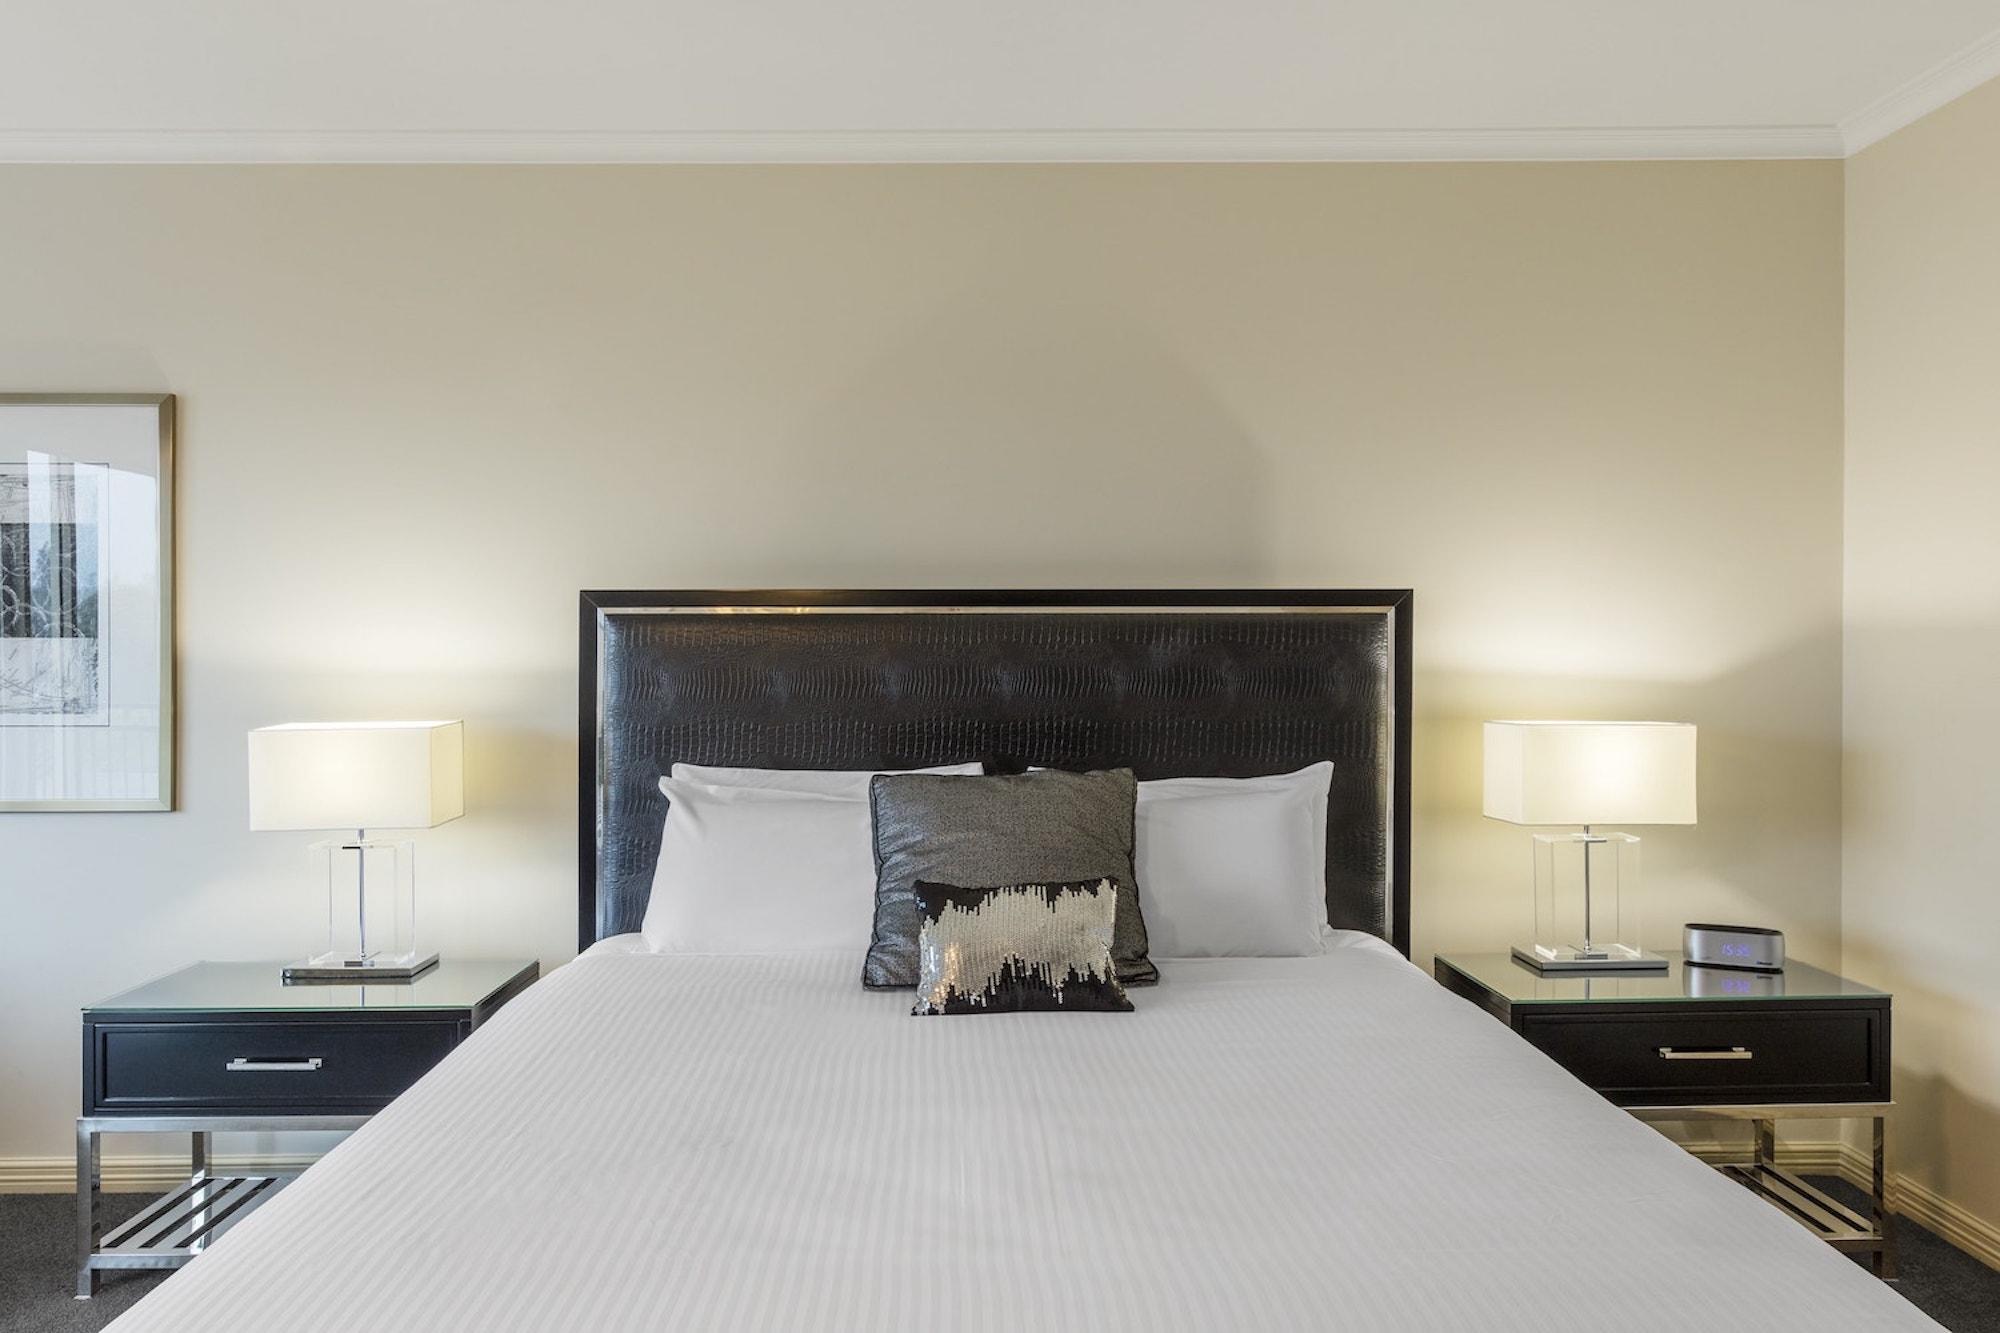 best-western-plus-the-carrington-shepparton-hotel-accommodation-executive-king-1.jpg